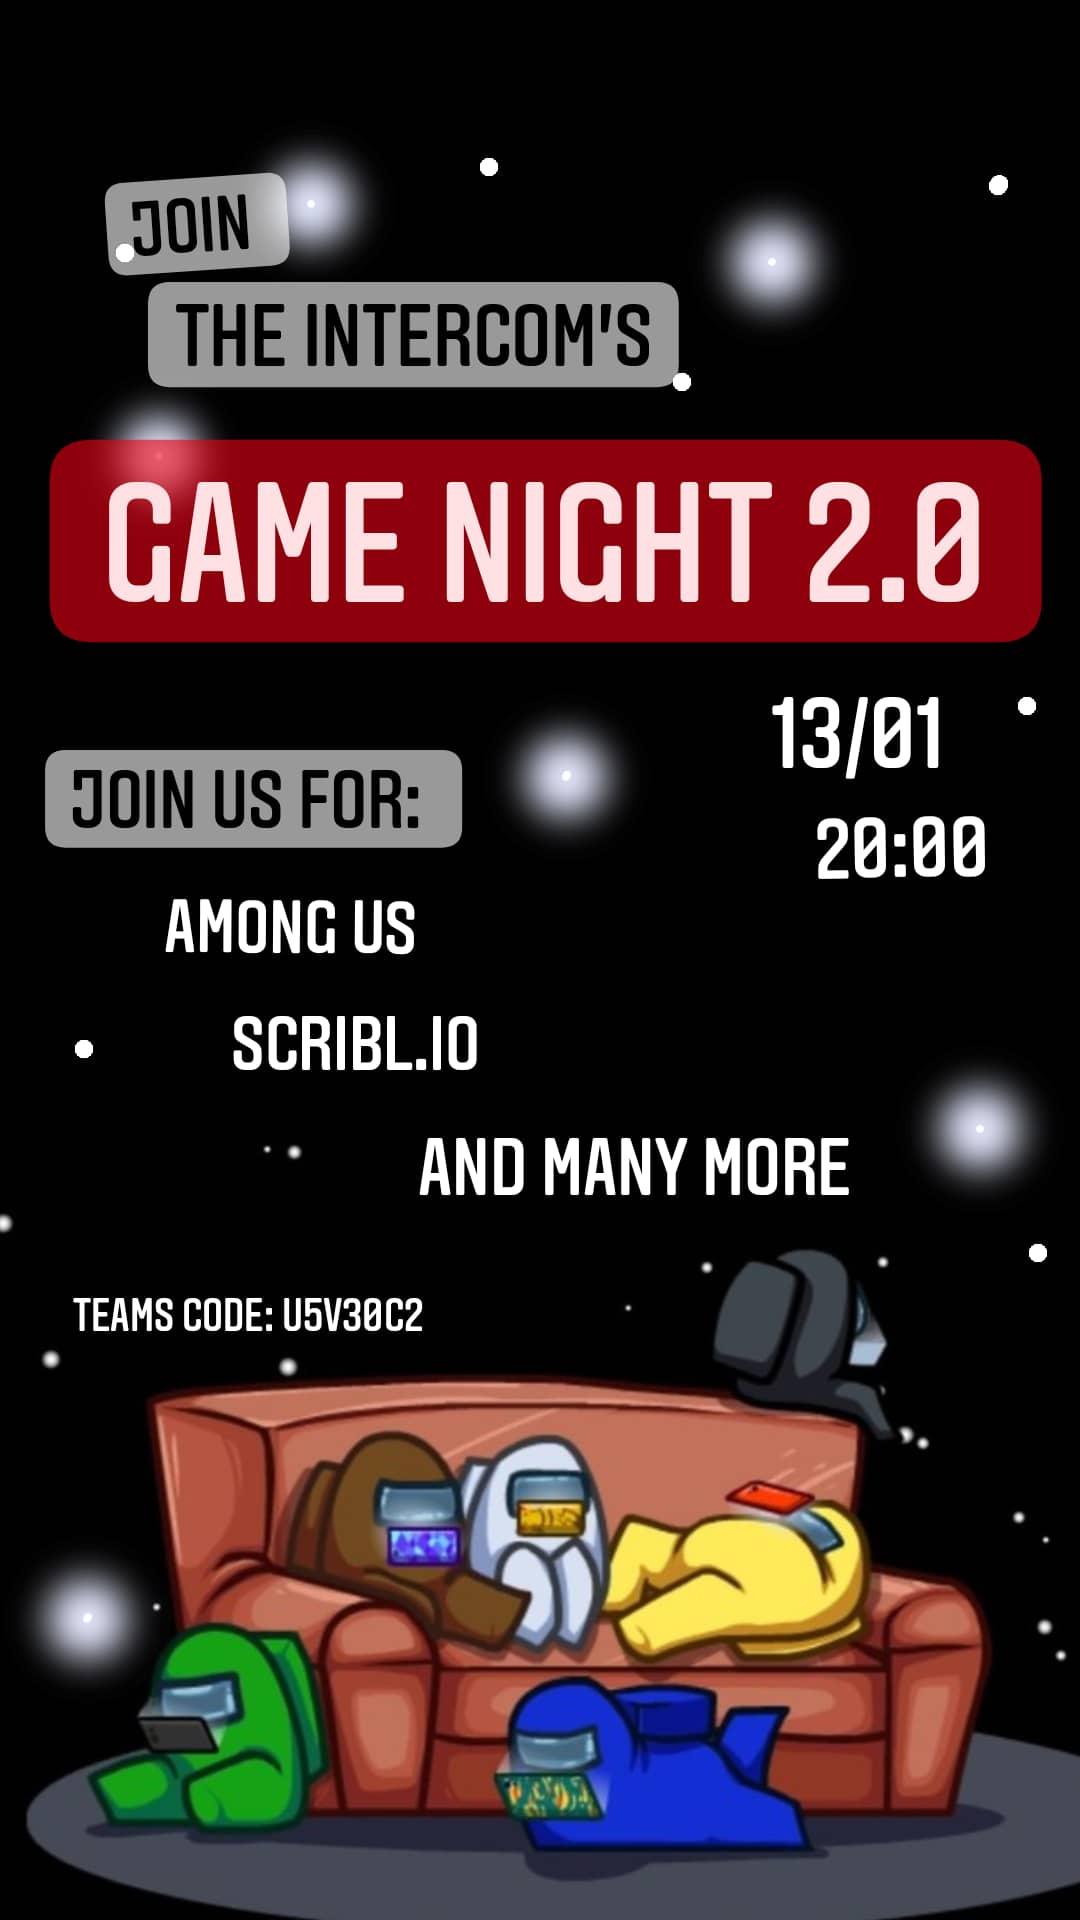 InterCom Game Night 2.0